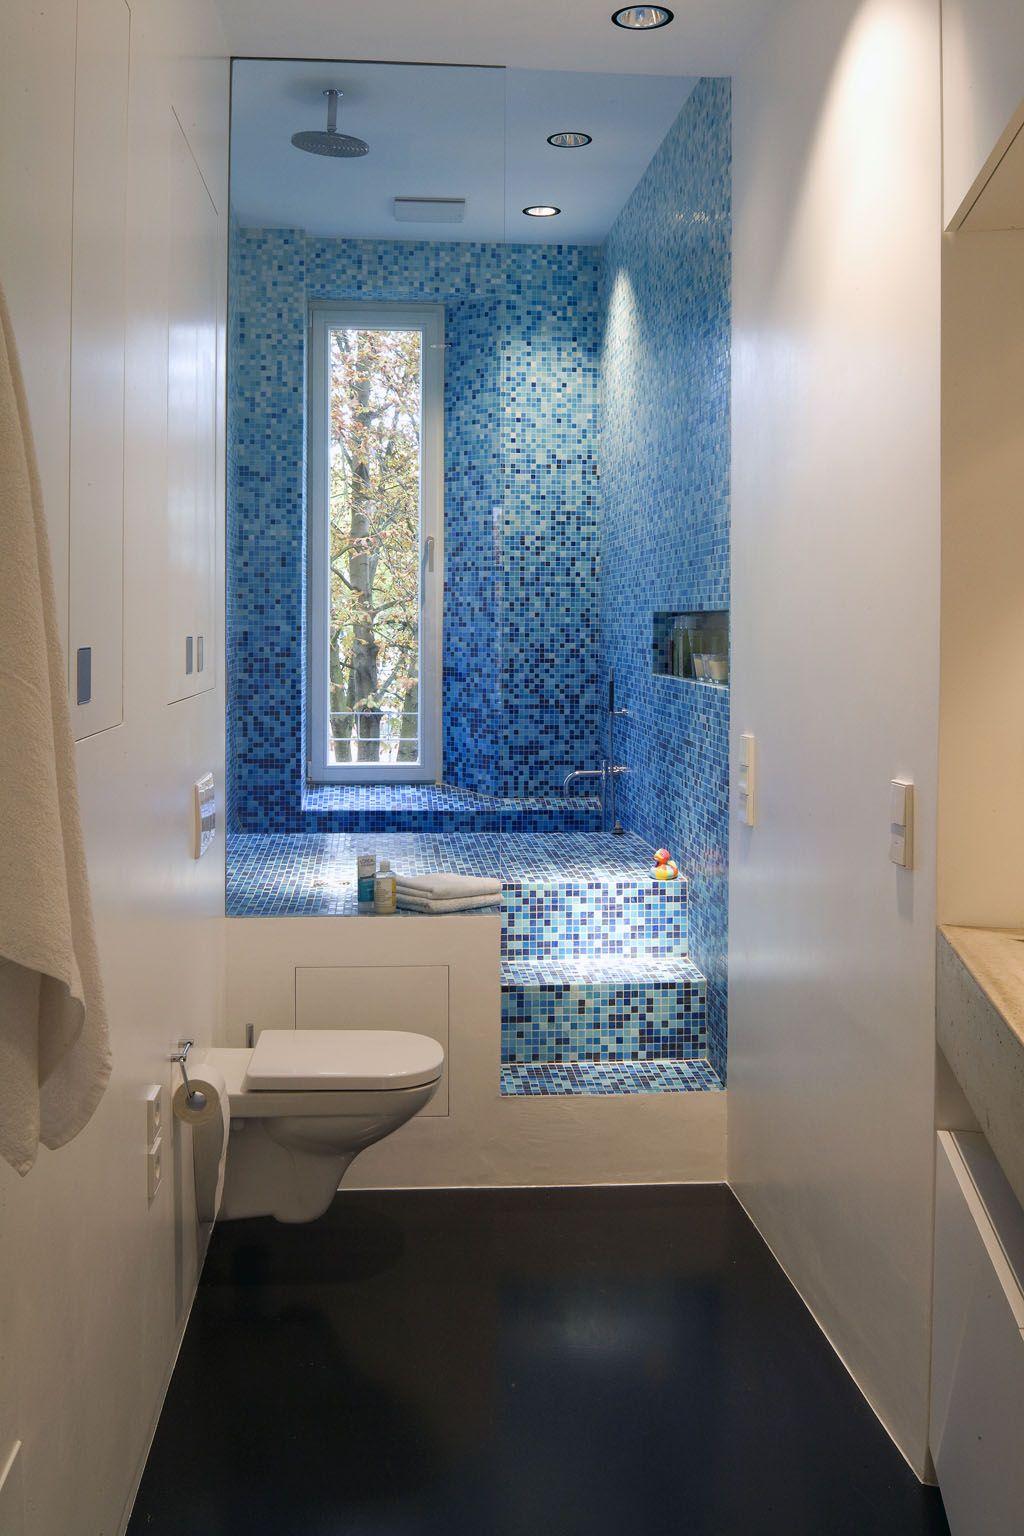 Badezimmer altbau cheap badezimmer ideen neue im bad fuboden badezimmer with badezimmer altbau - Altbau badezimmer ...